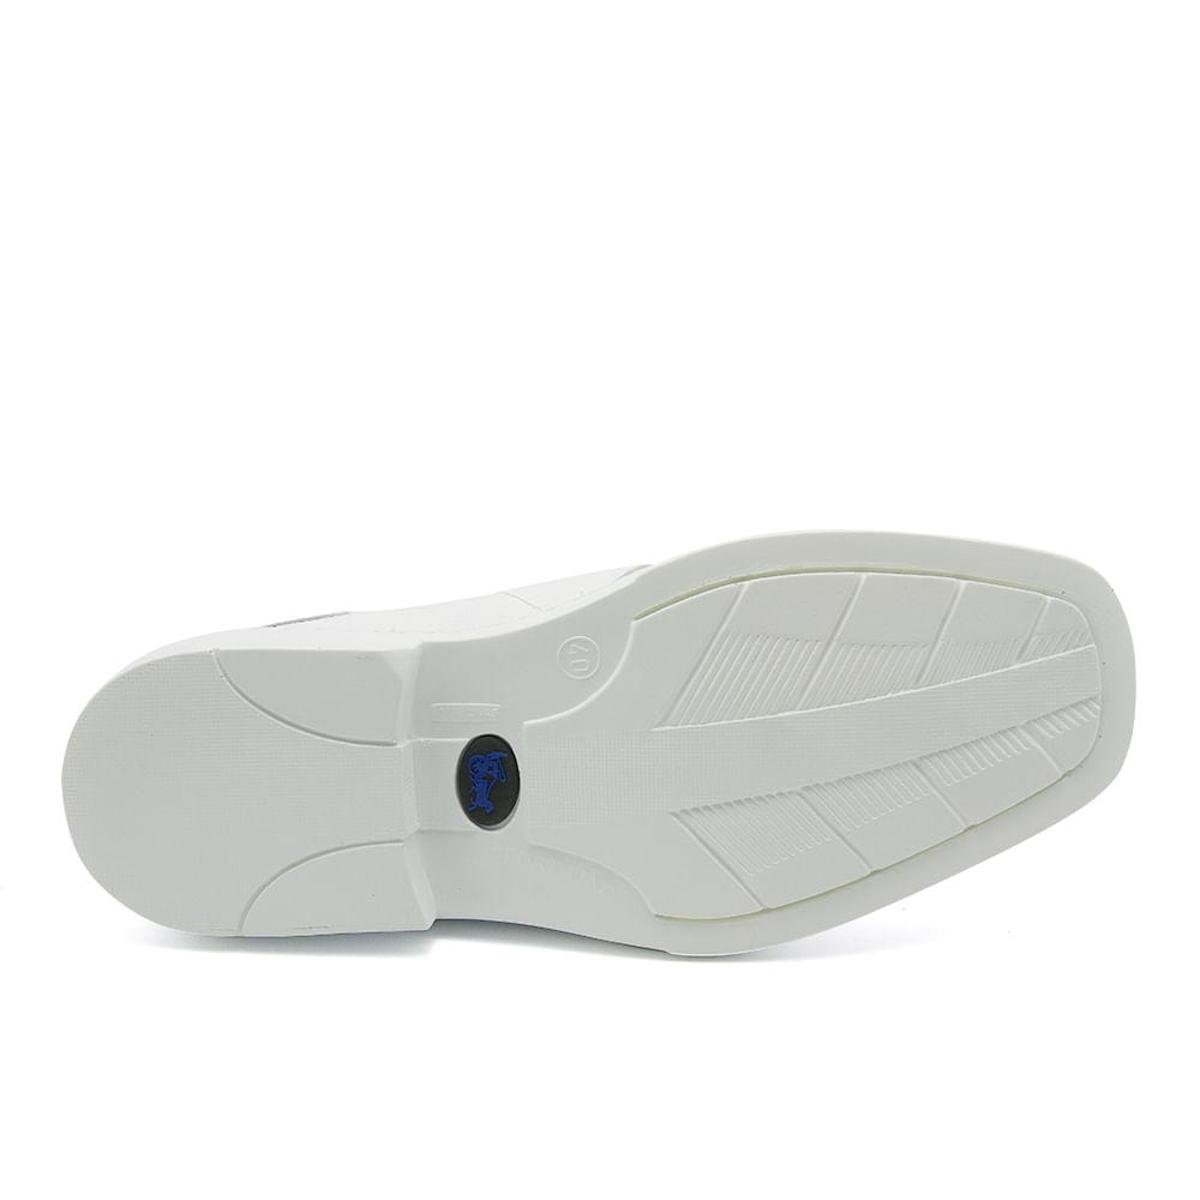 Branco Sapato Doctor Comfort Doctor Sapato Shoes Comfort 910 Shoes Rg8qRSO